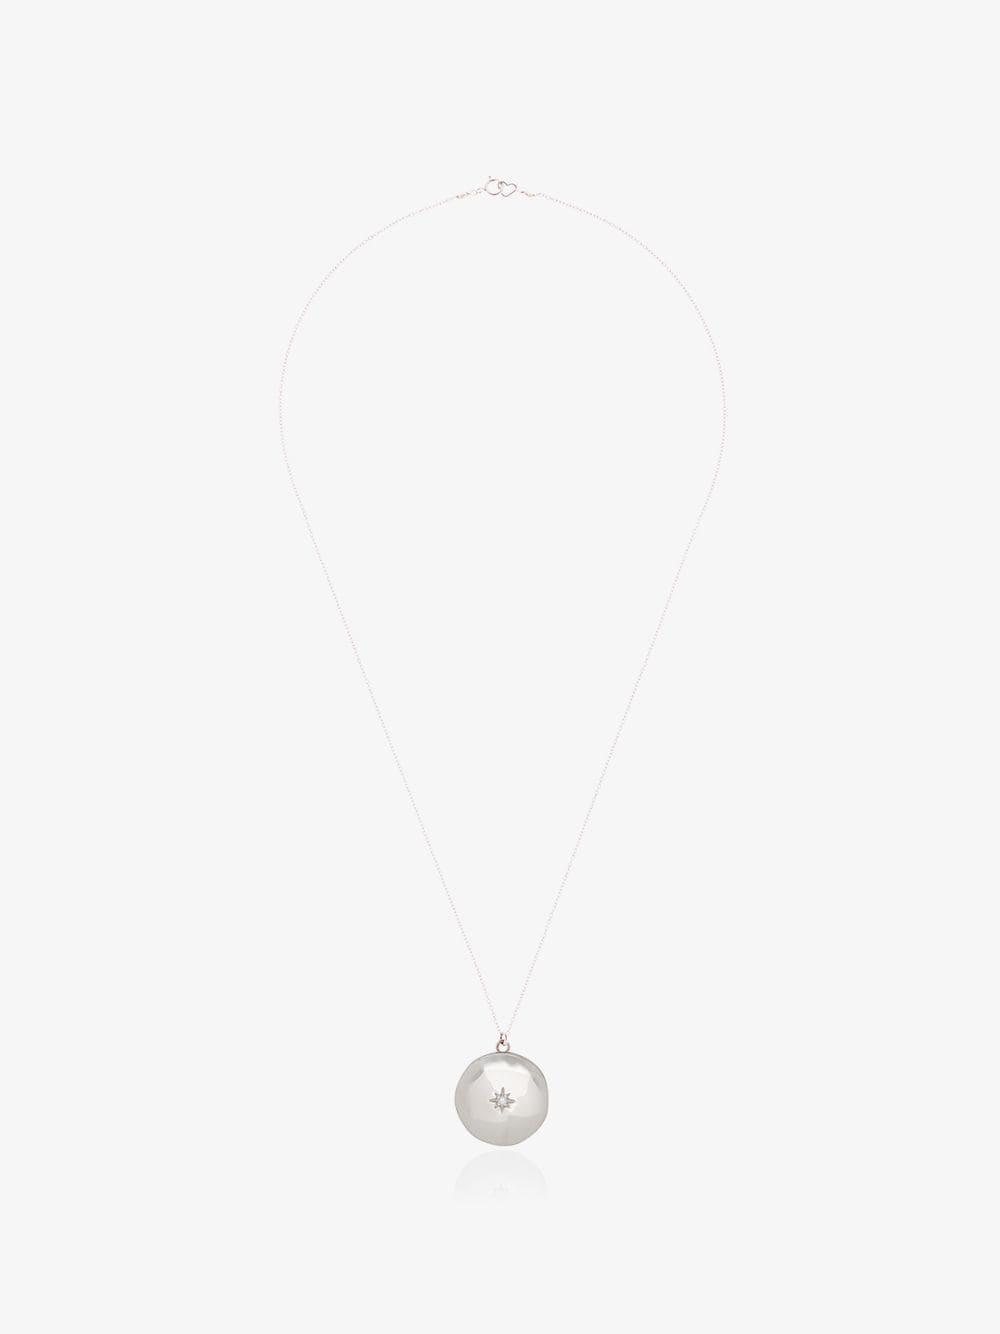 Sasha Samuel Maxine necklace in metallic